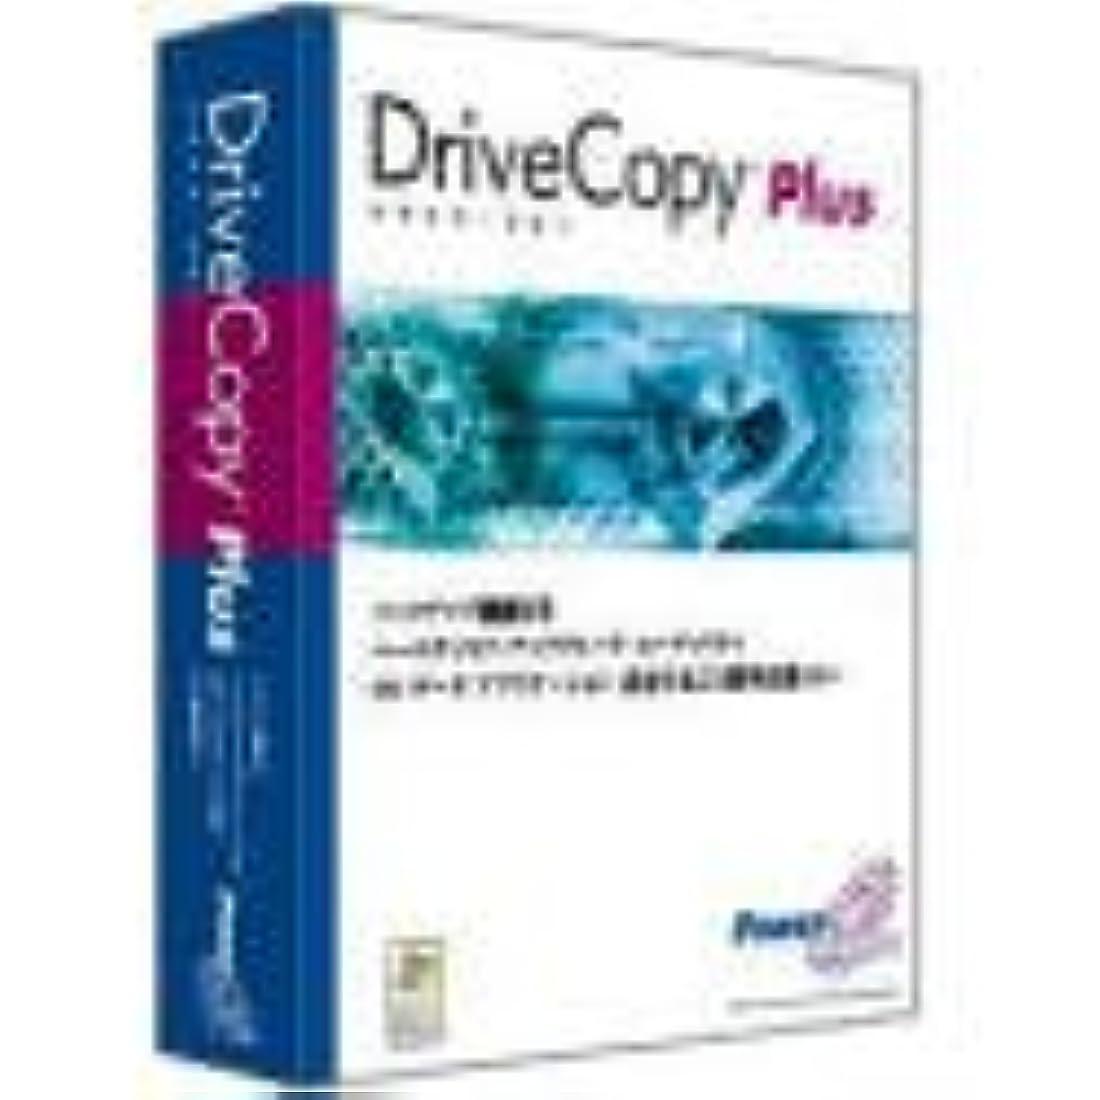 チーフ放映歯痛PowerQuest Drive Copy Plus